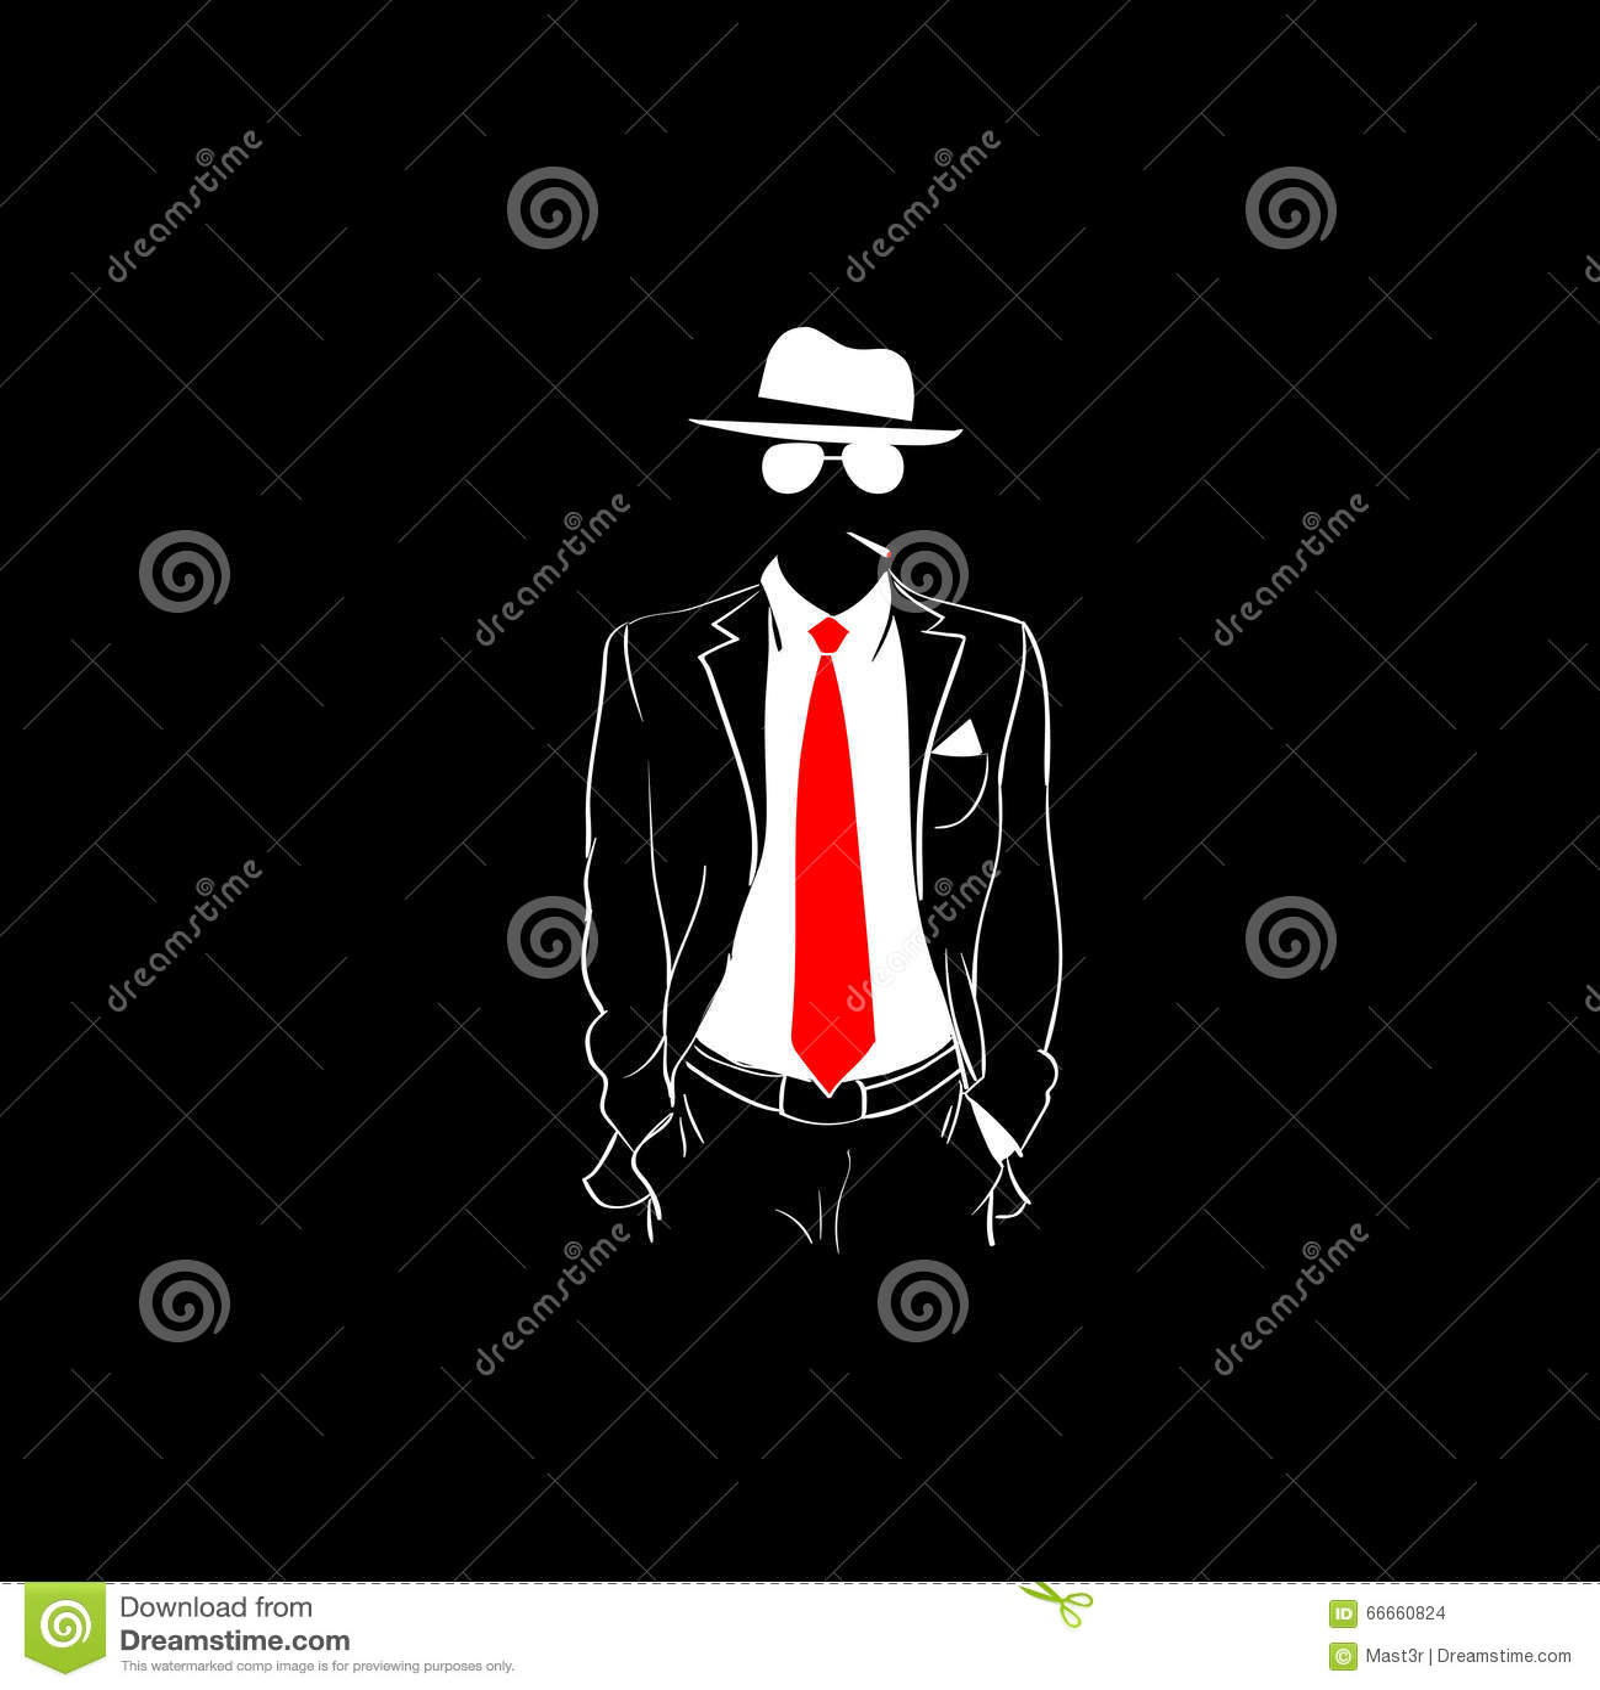 man silhouette suit red tie wear glasses white hat black